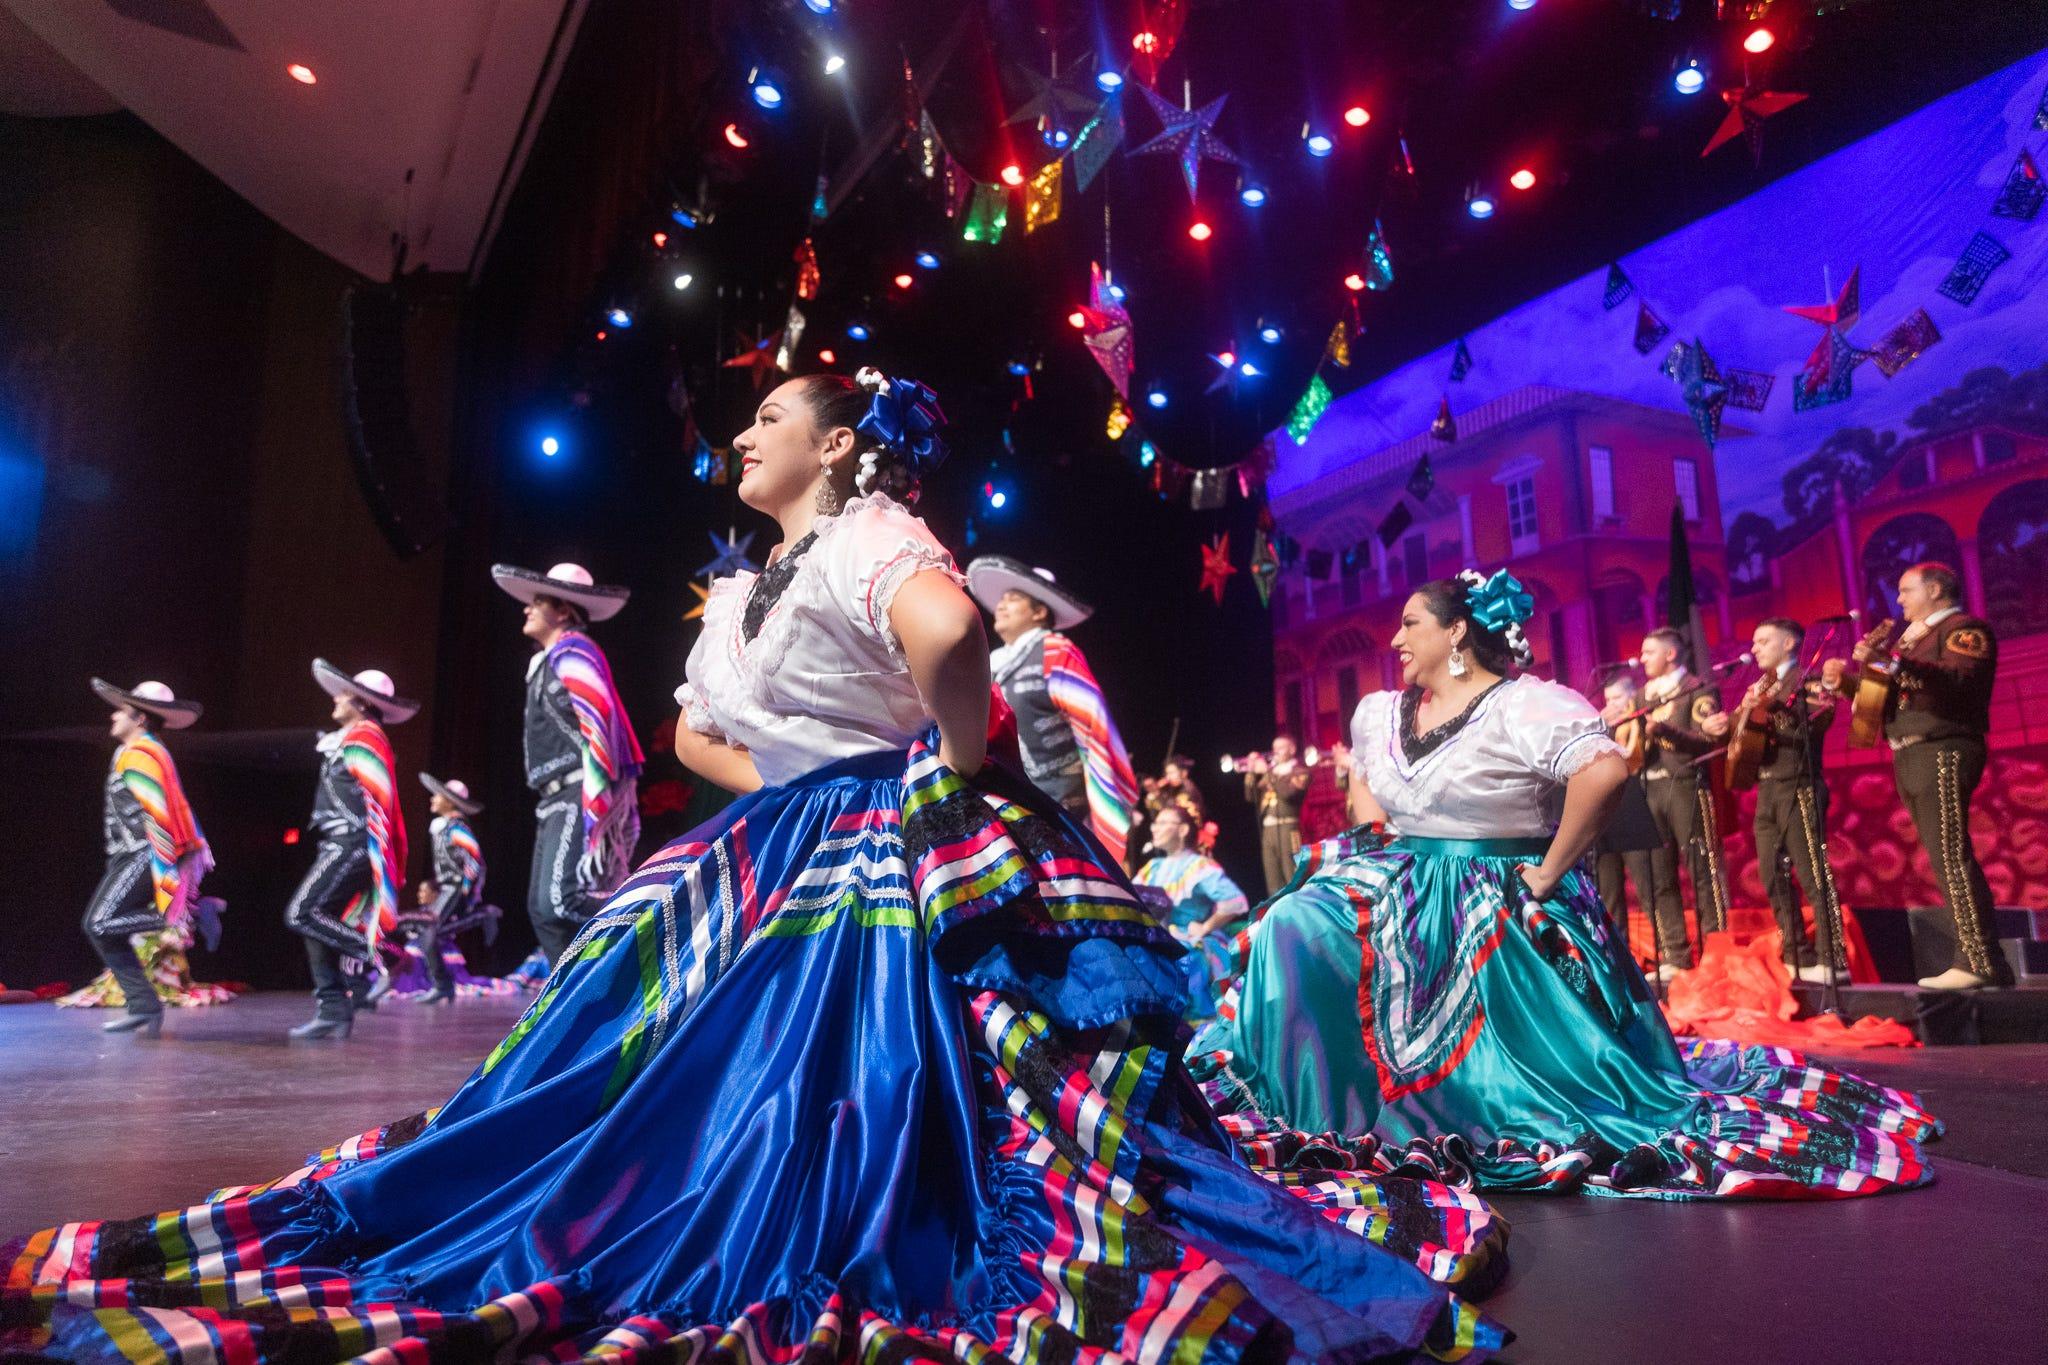 The 22nd Annual Mariachi & Folklórico Festival, ballet folklórico dancers danced alongside a mariachi group at the Chandler Center for the Arts.